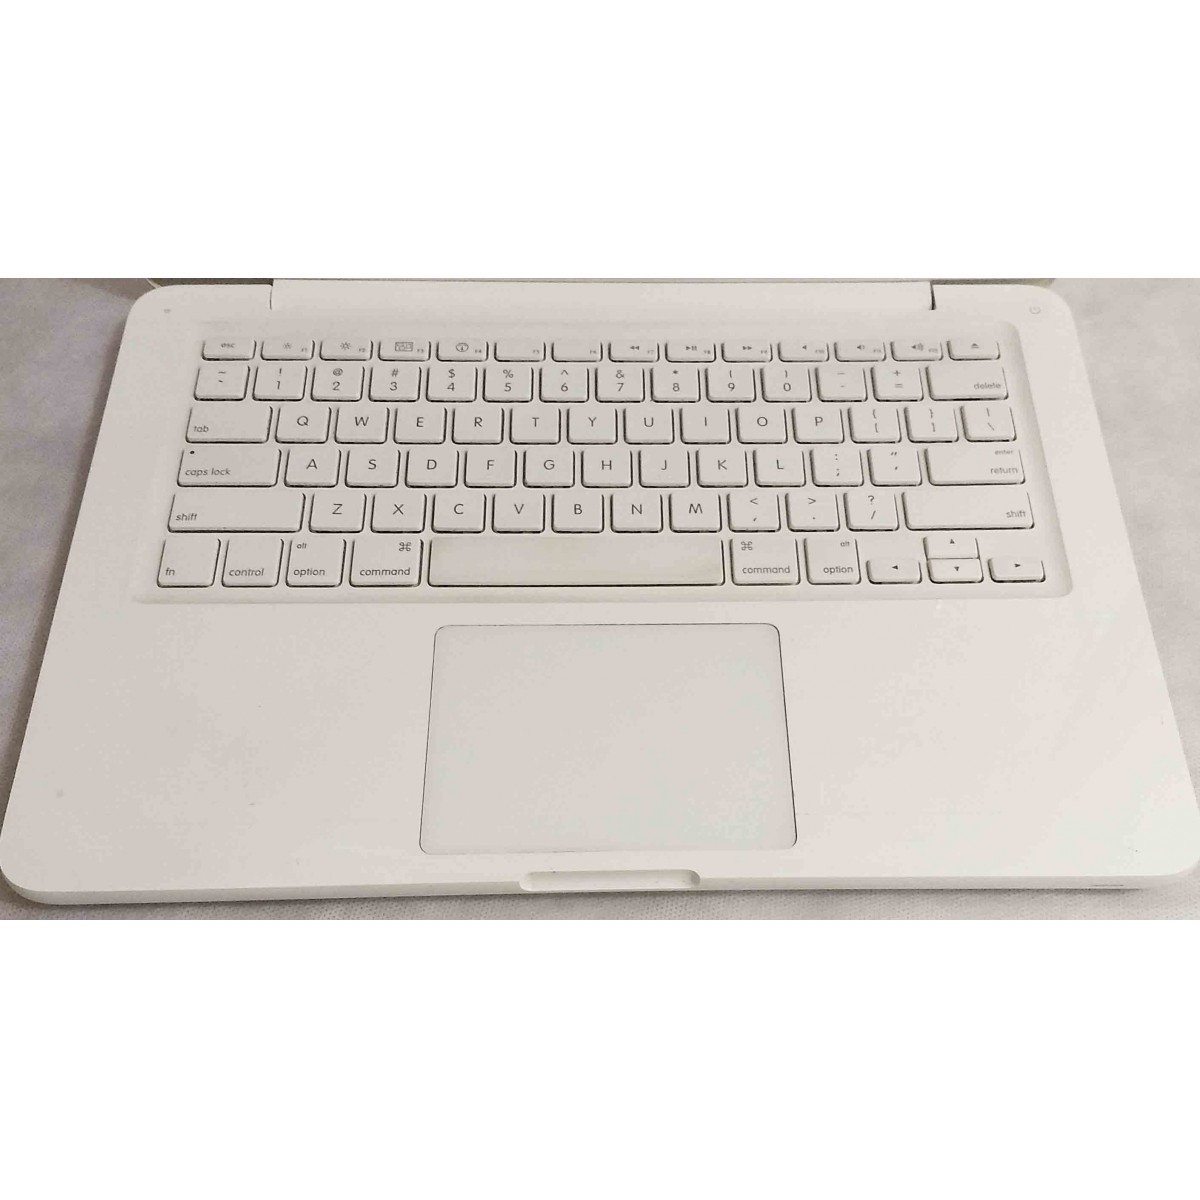 Macbook White MC207LL/A 13.3'' Core 2 Duo 2.26GHz 4GB HD-250GB